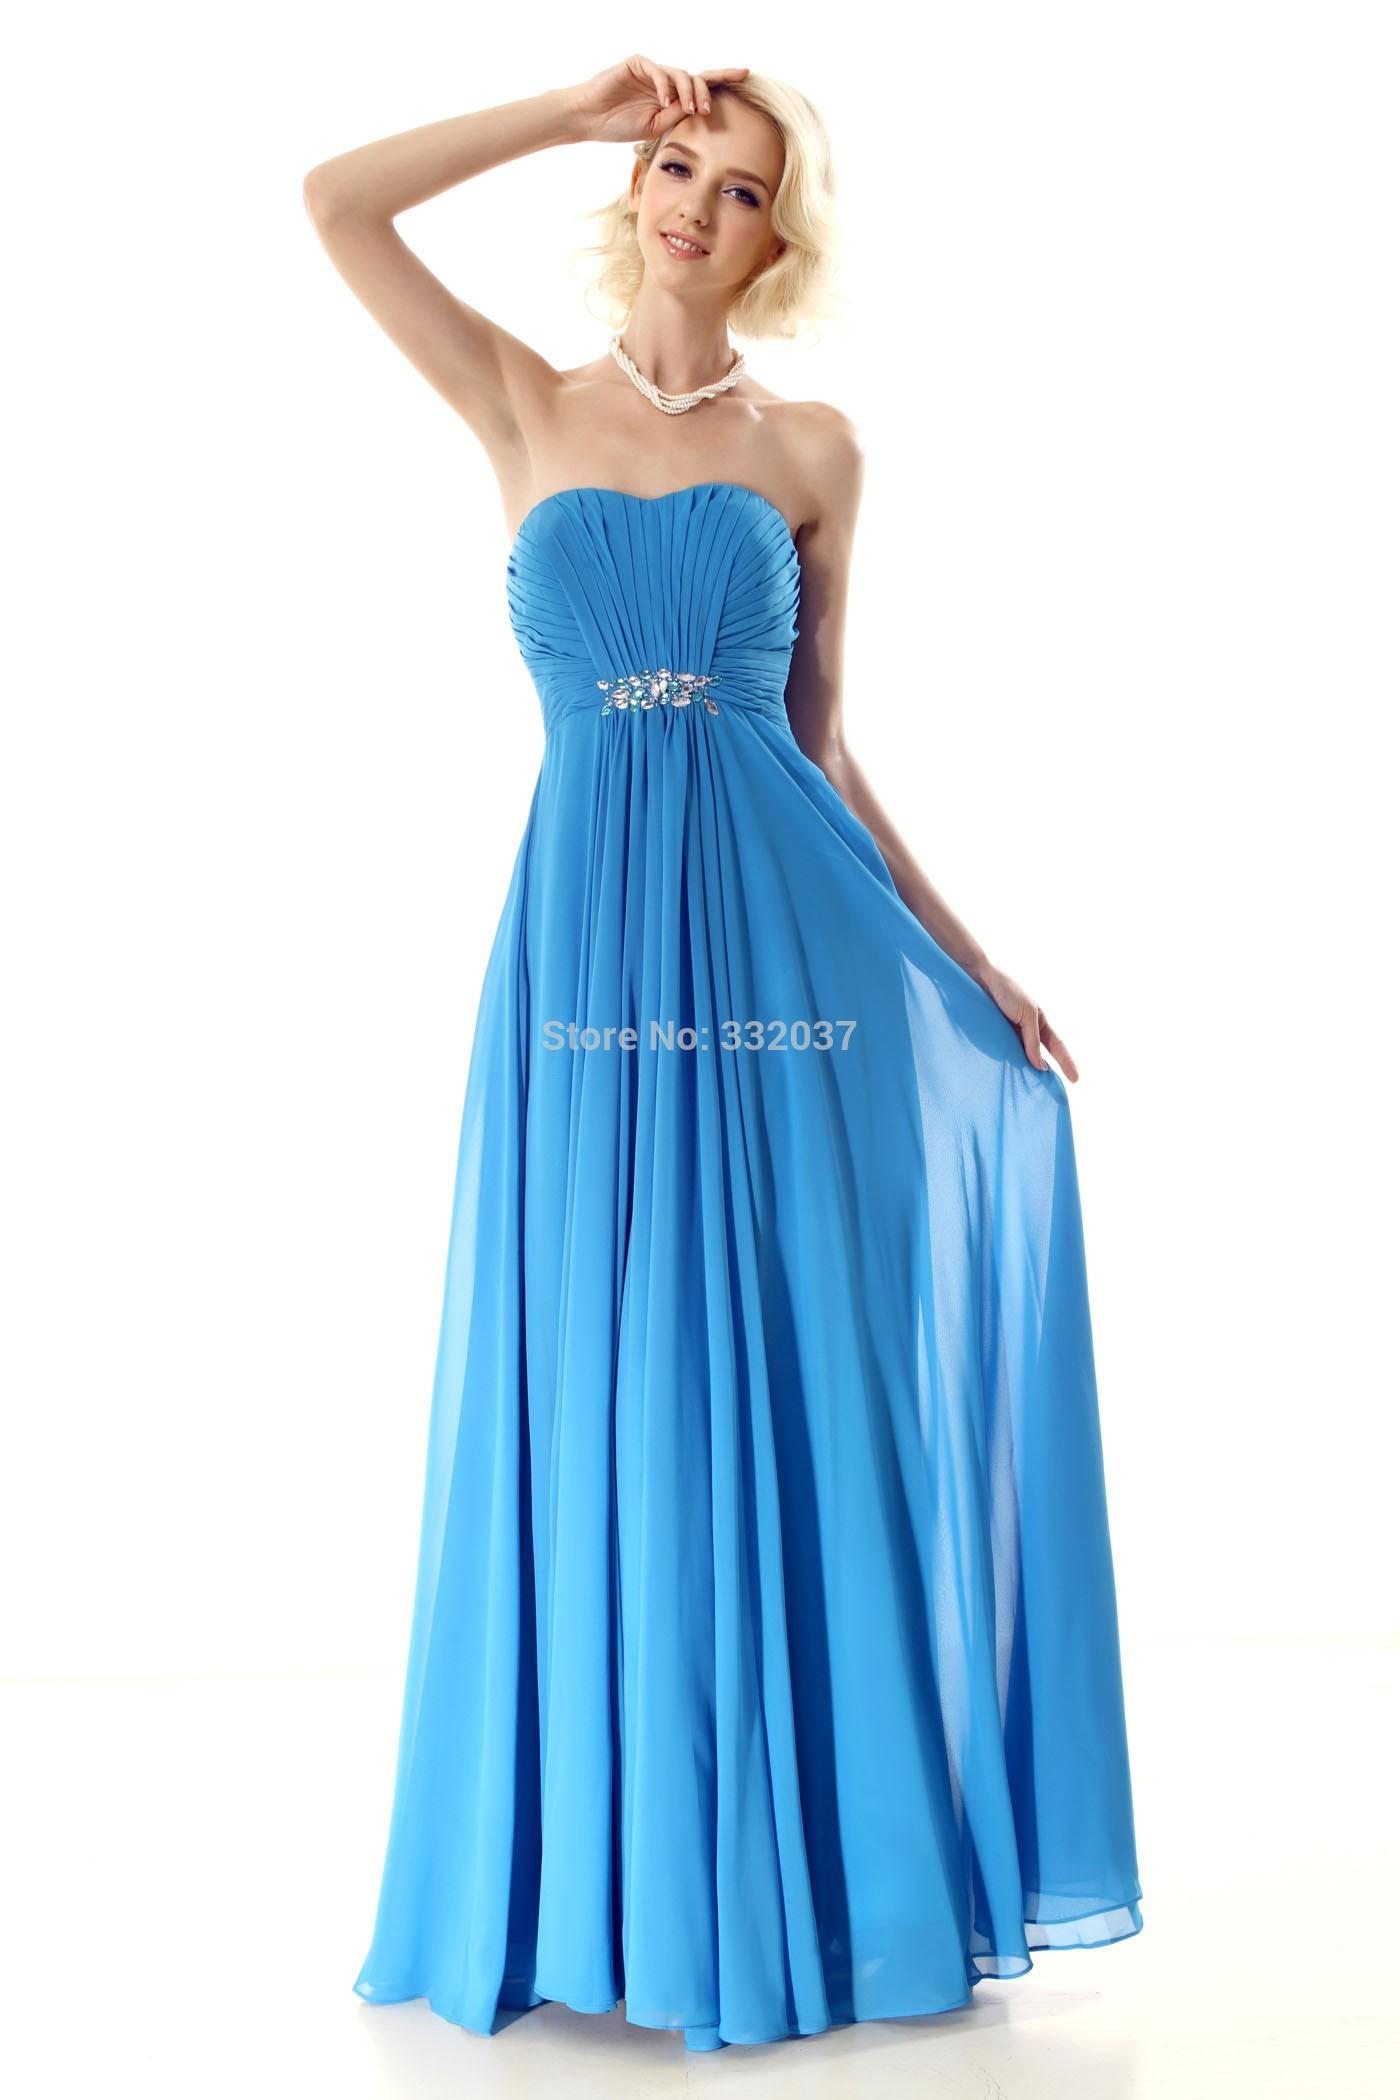 Evening Dresses Under 20 Dollars